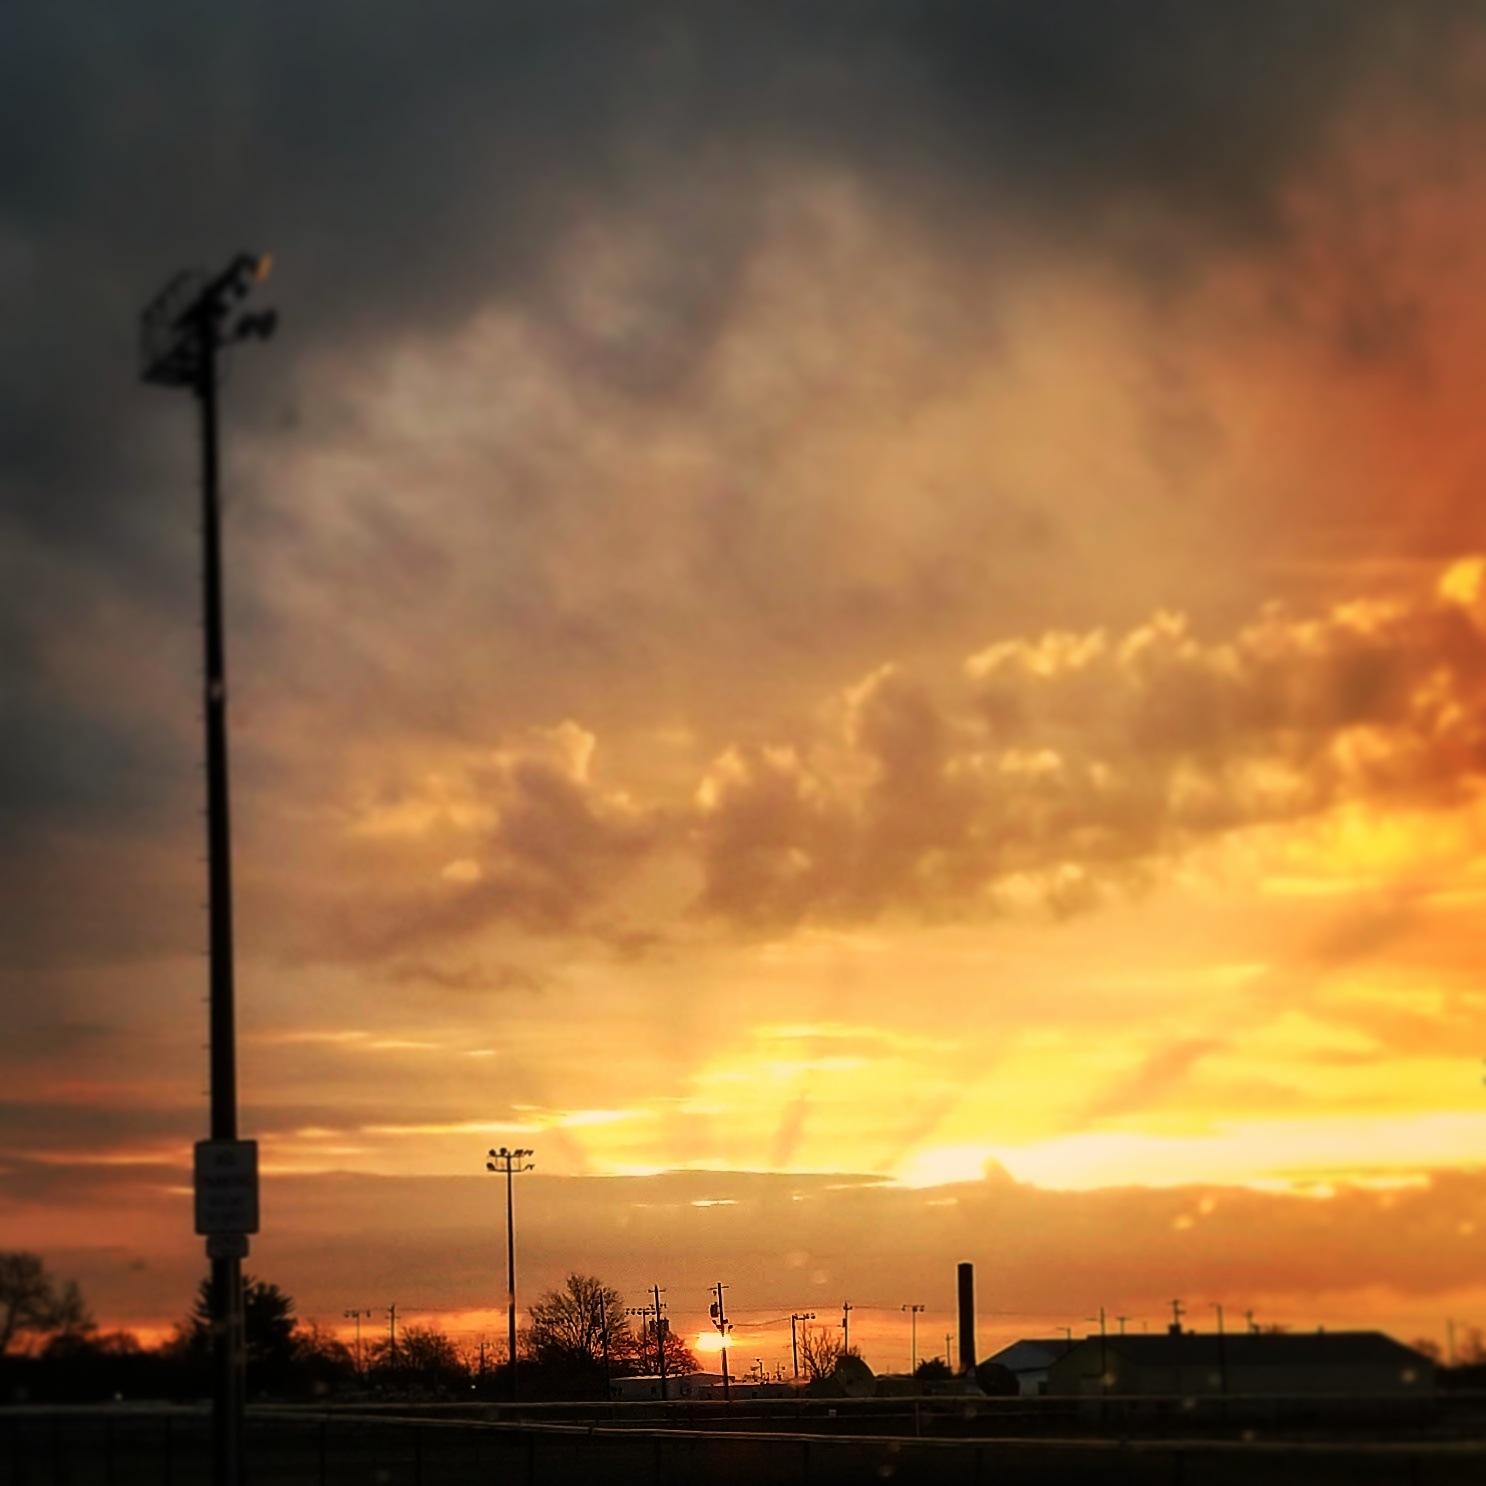 sunrise by David Lincoln